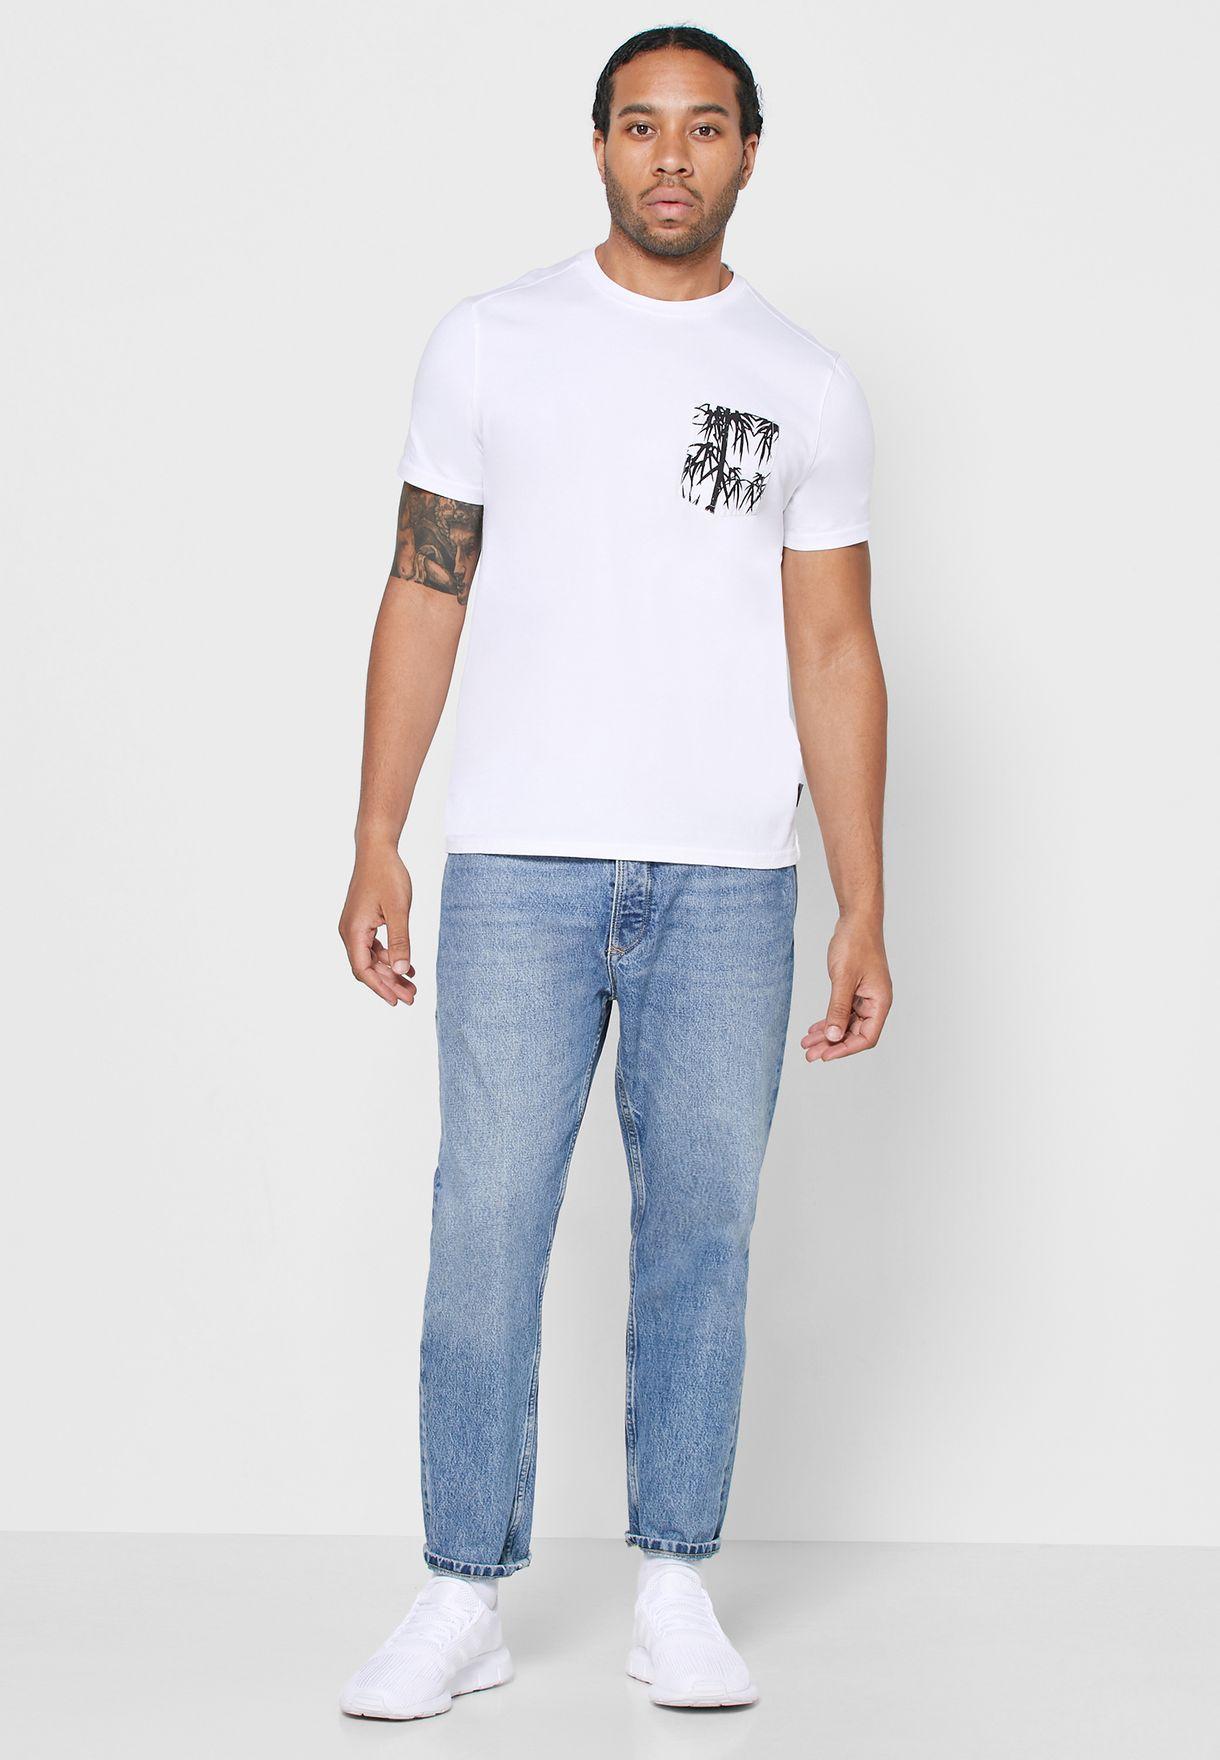 Bayfront Crew Neck T-Shirt